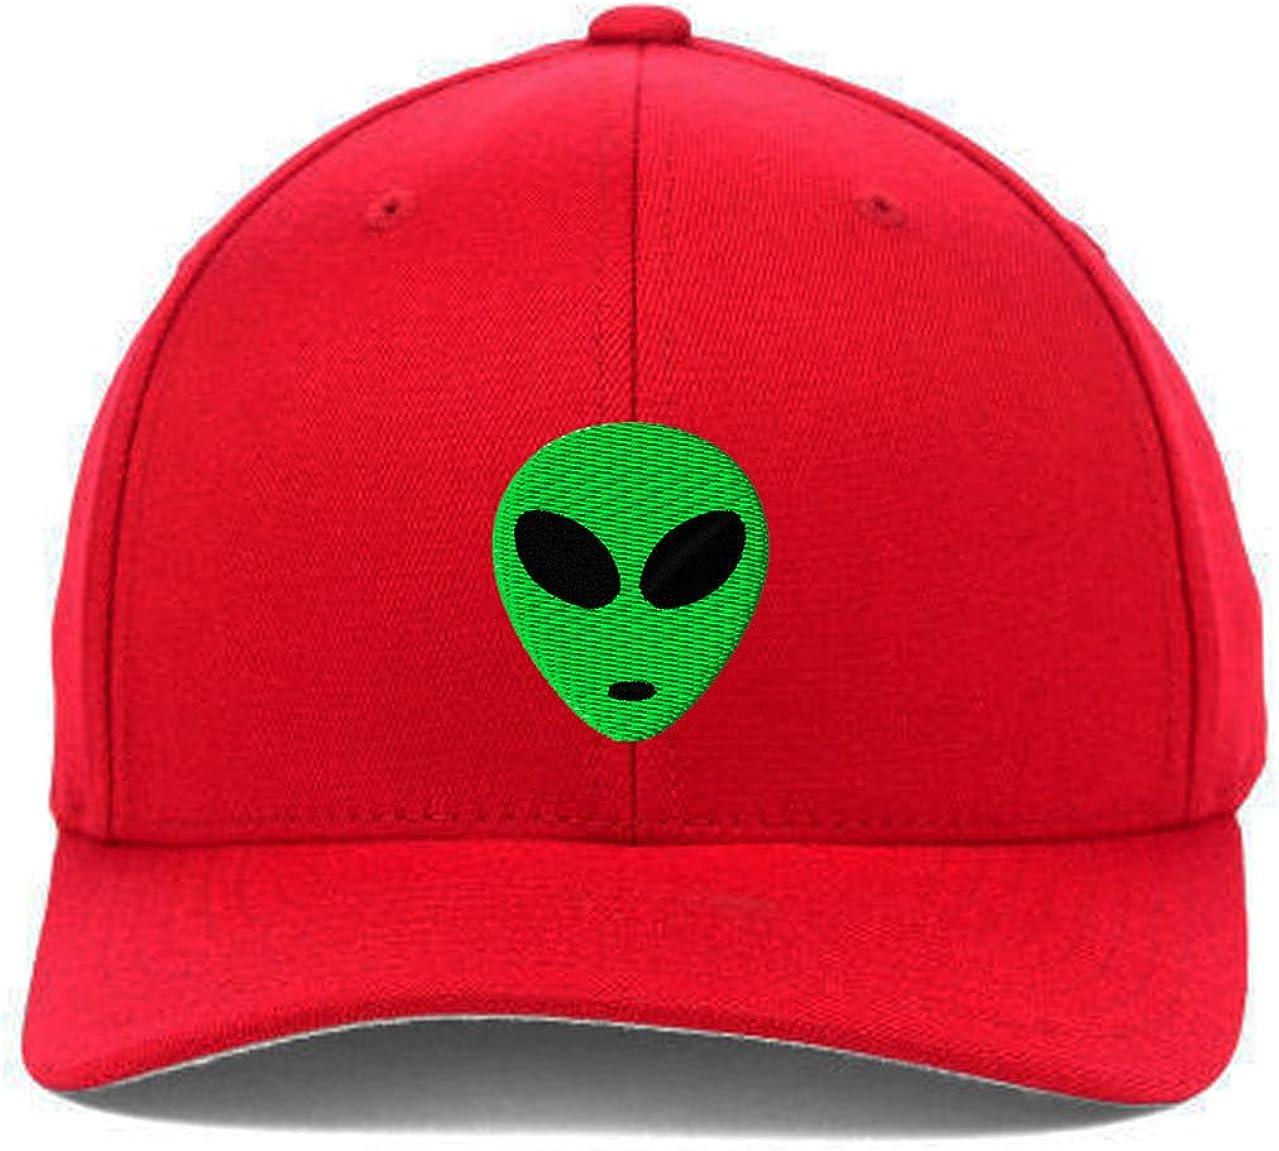 Green Alien Head Embroidered Flexfit Hats